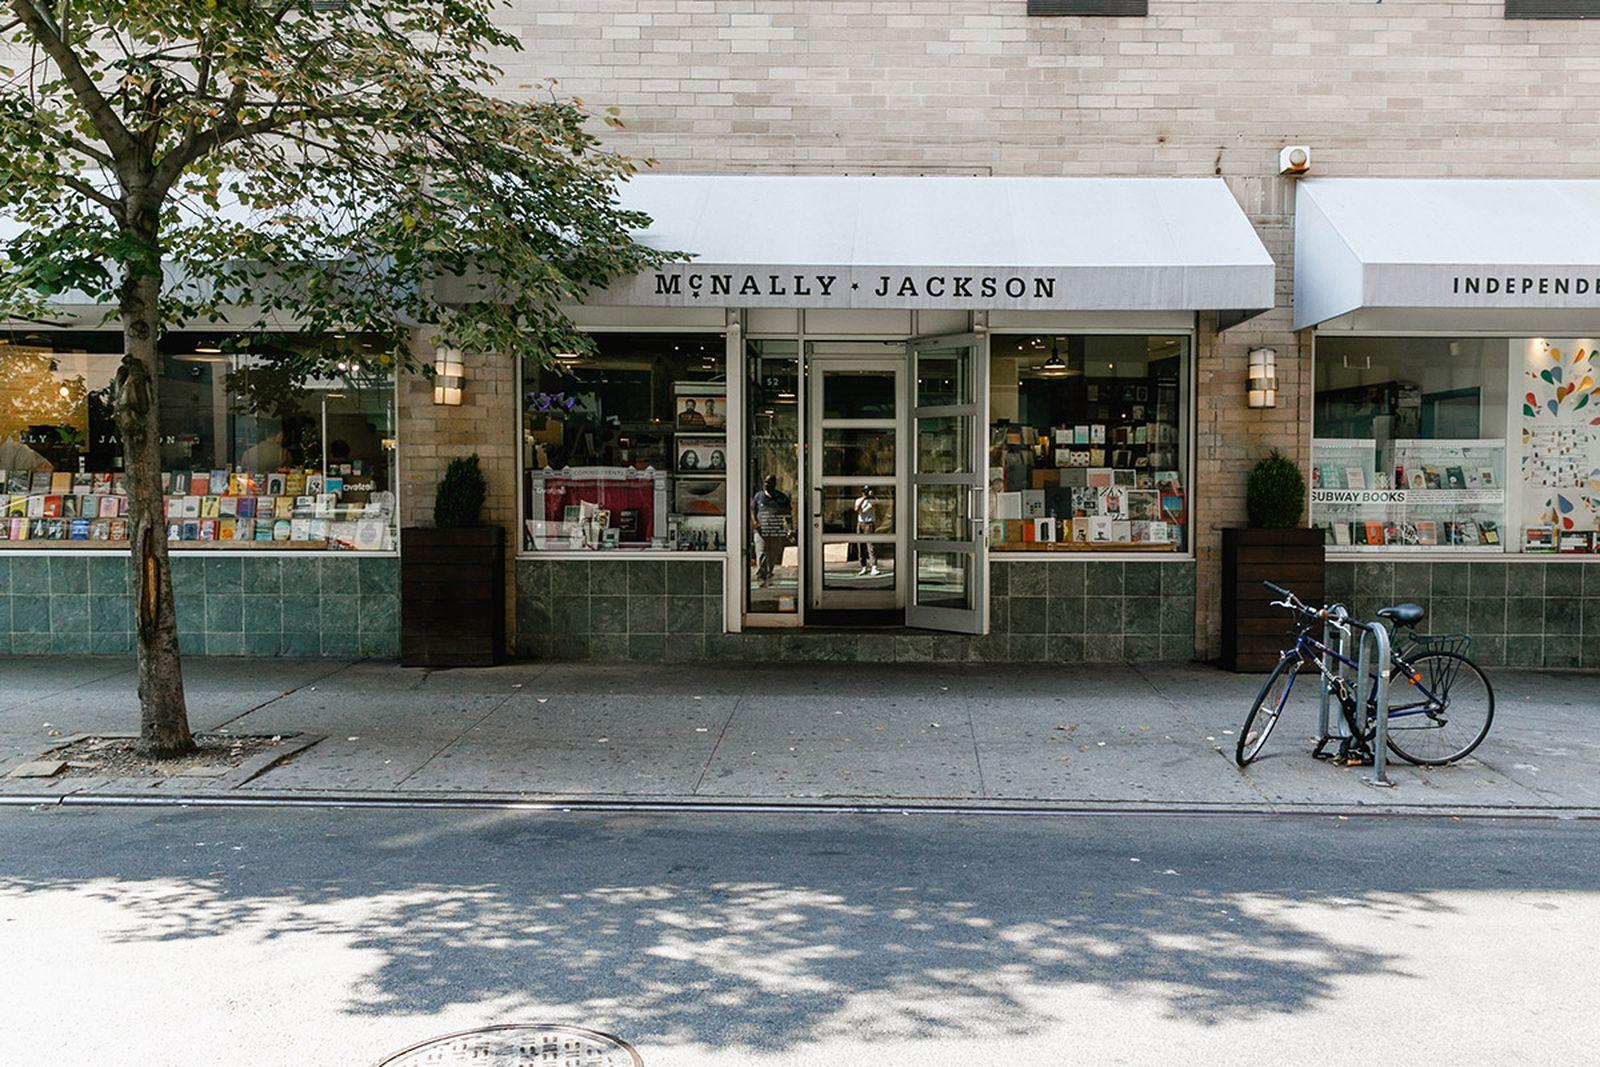 Amex NYC Bookstores McNally Jackson american express platinum art & museums new york